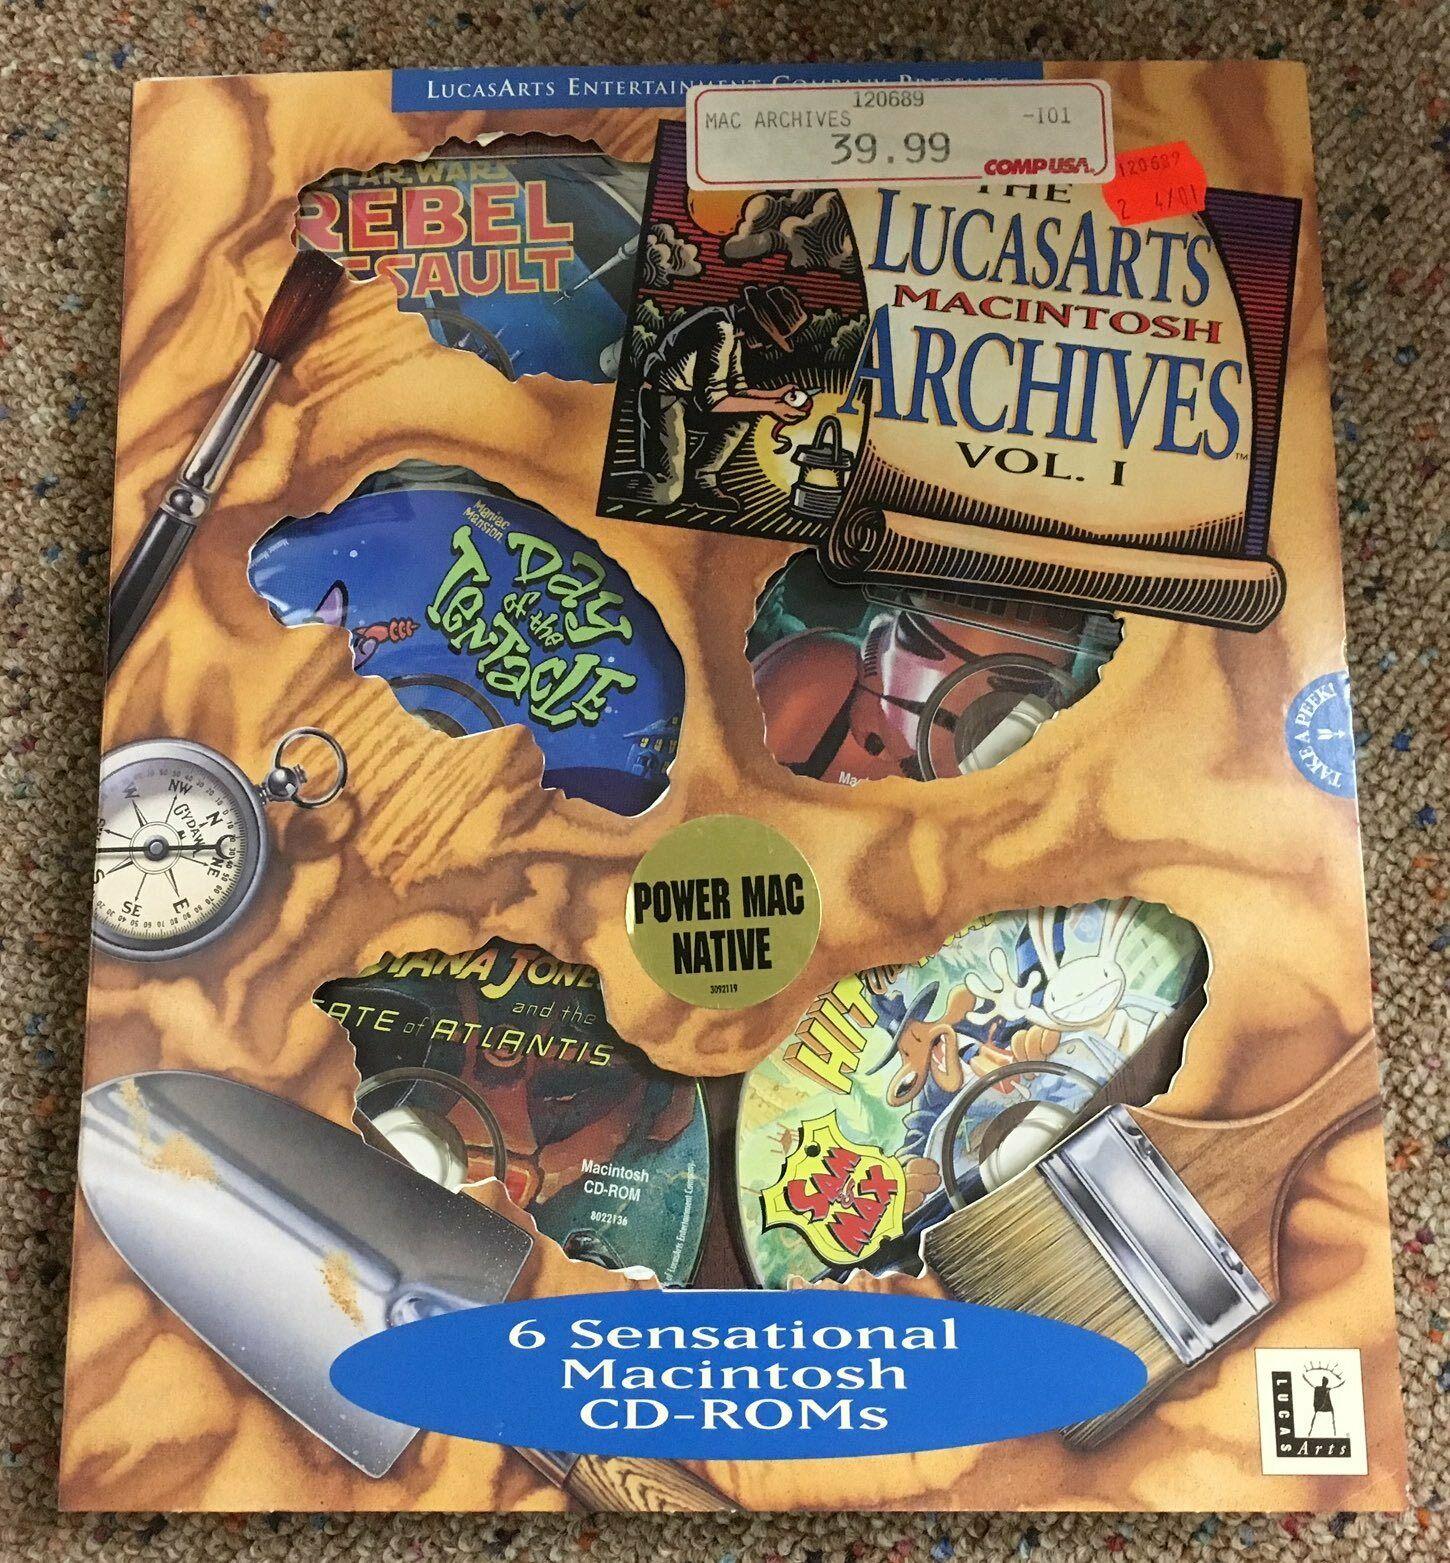 The LucasArts Macintosh Archives Vol I.